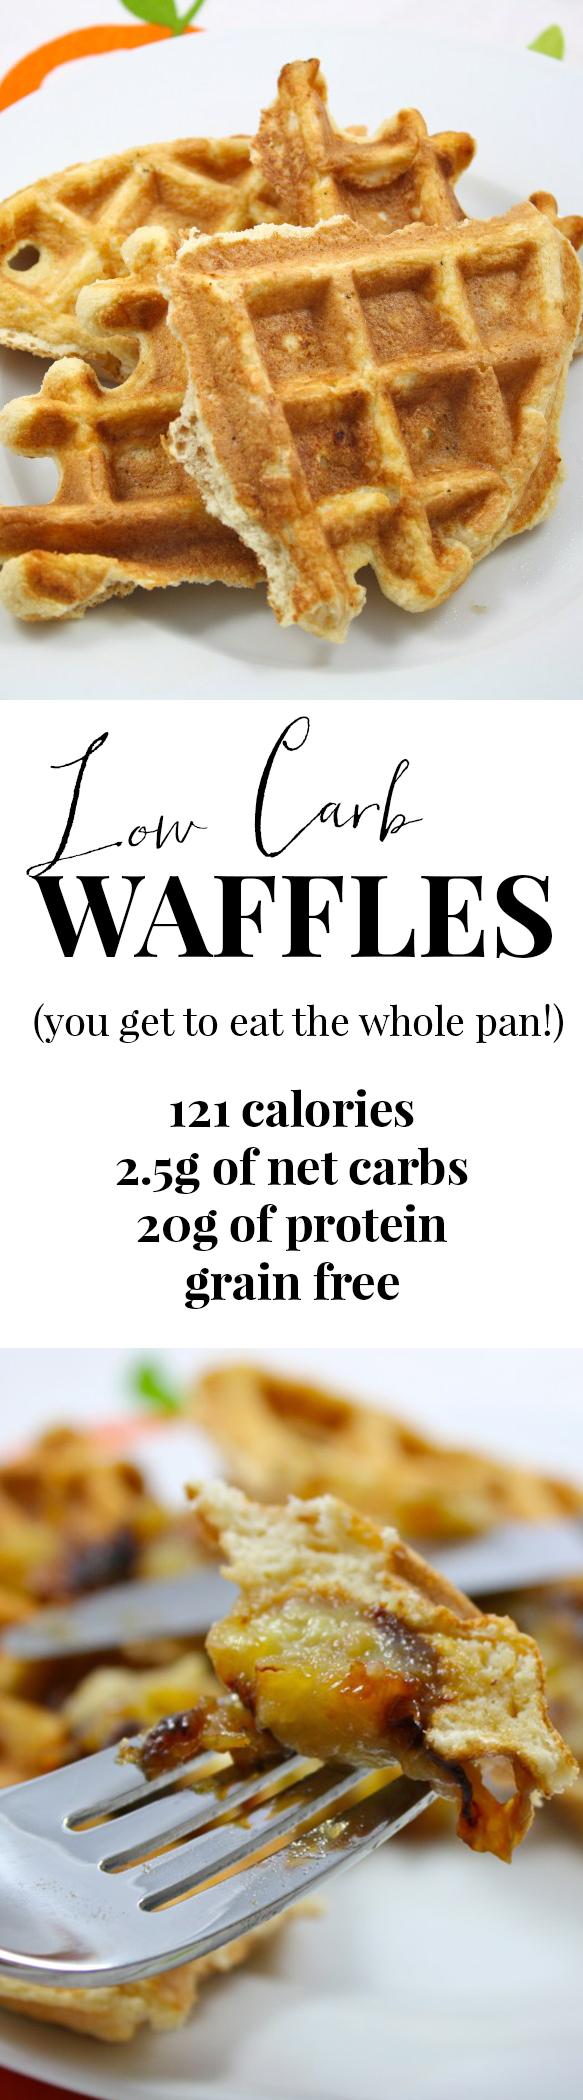 Waffles Pinterest